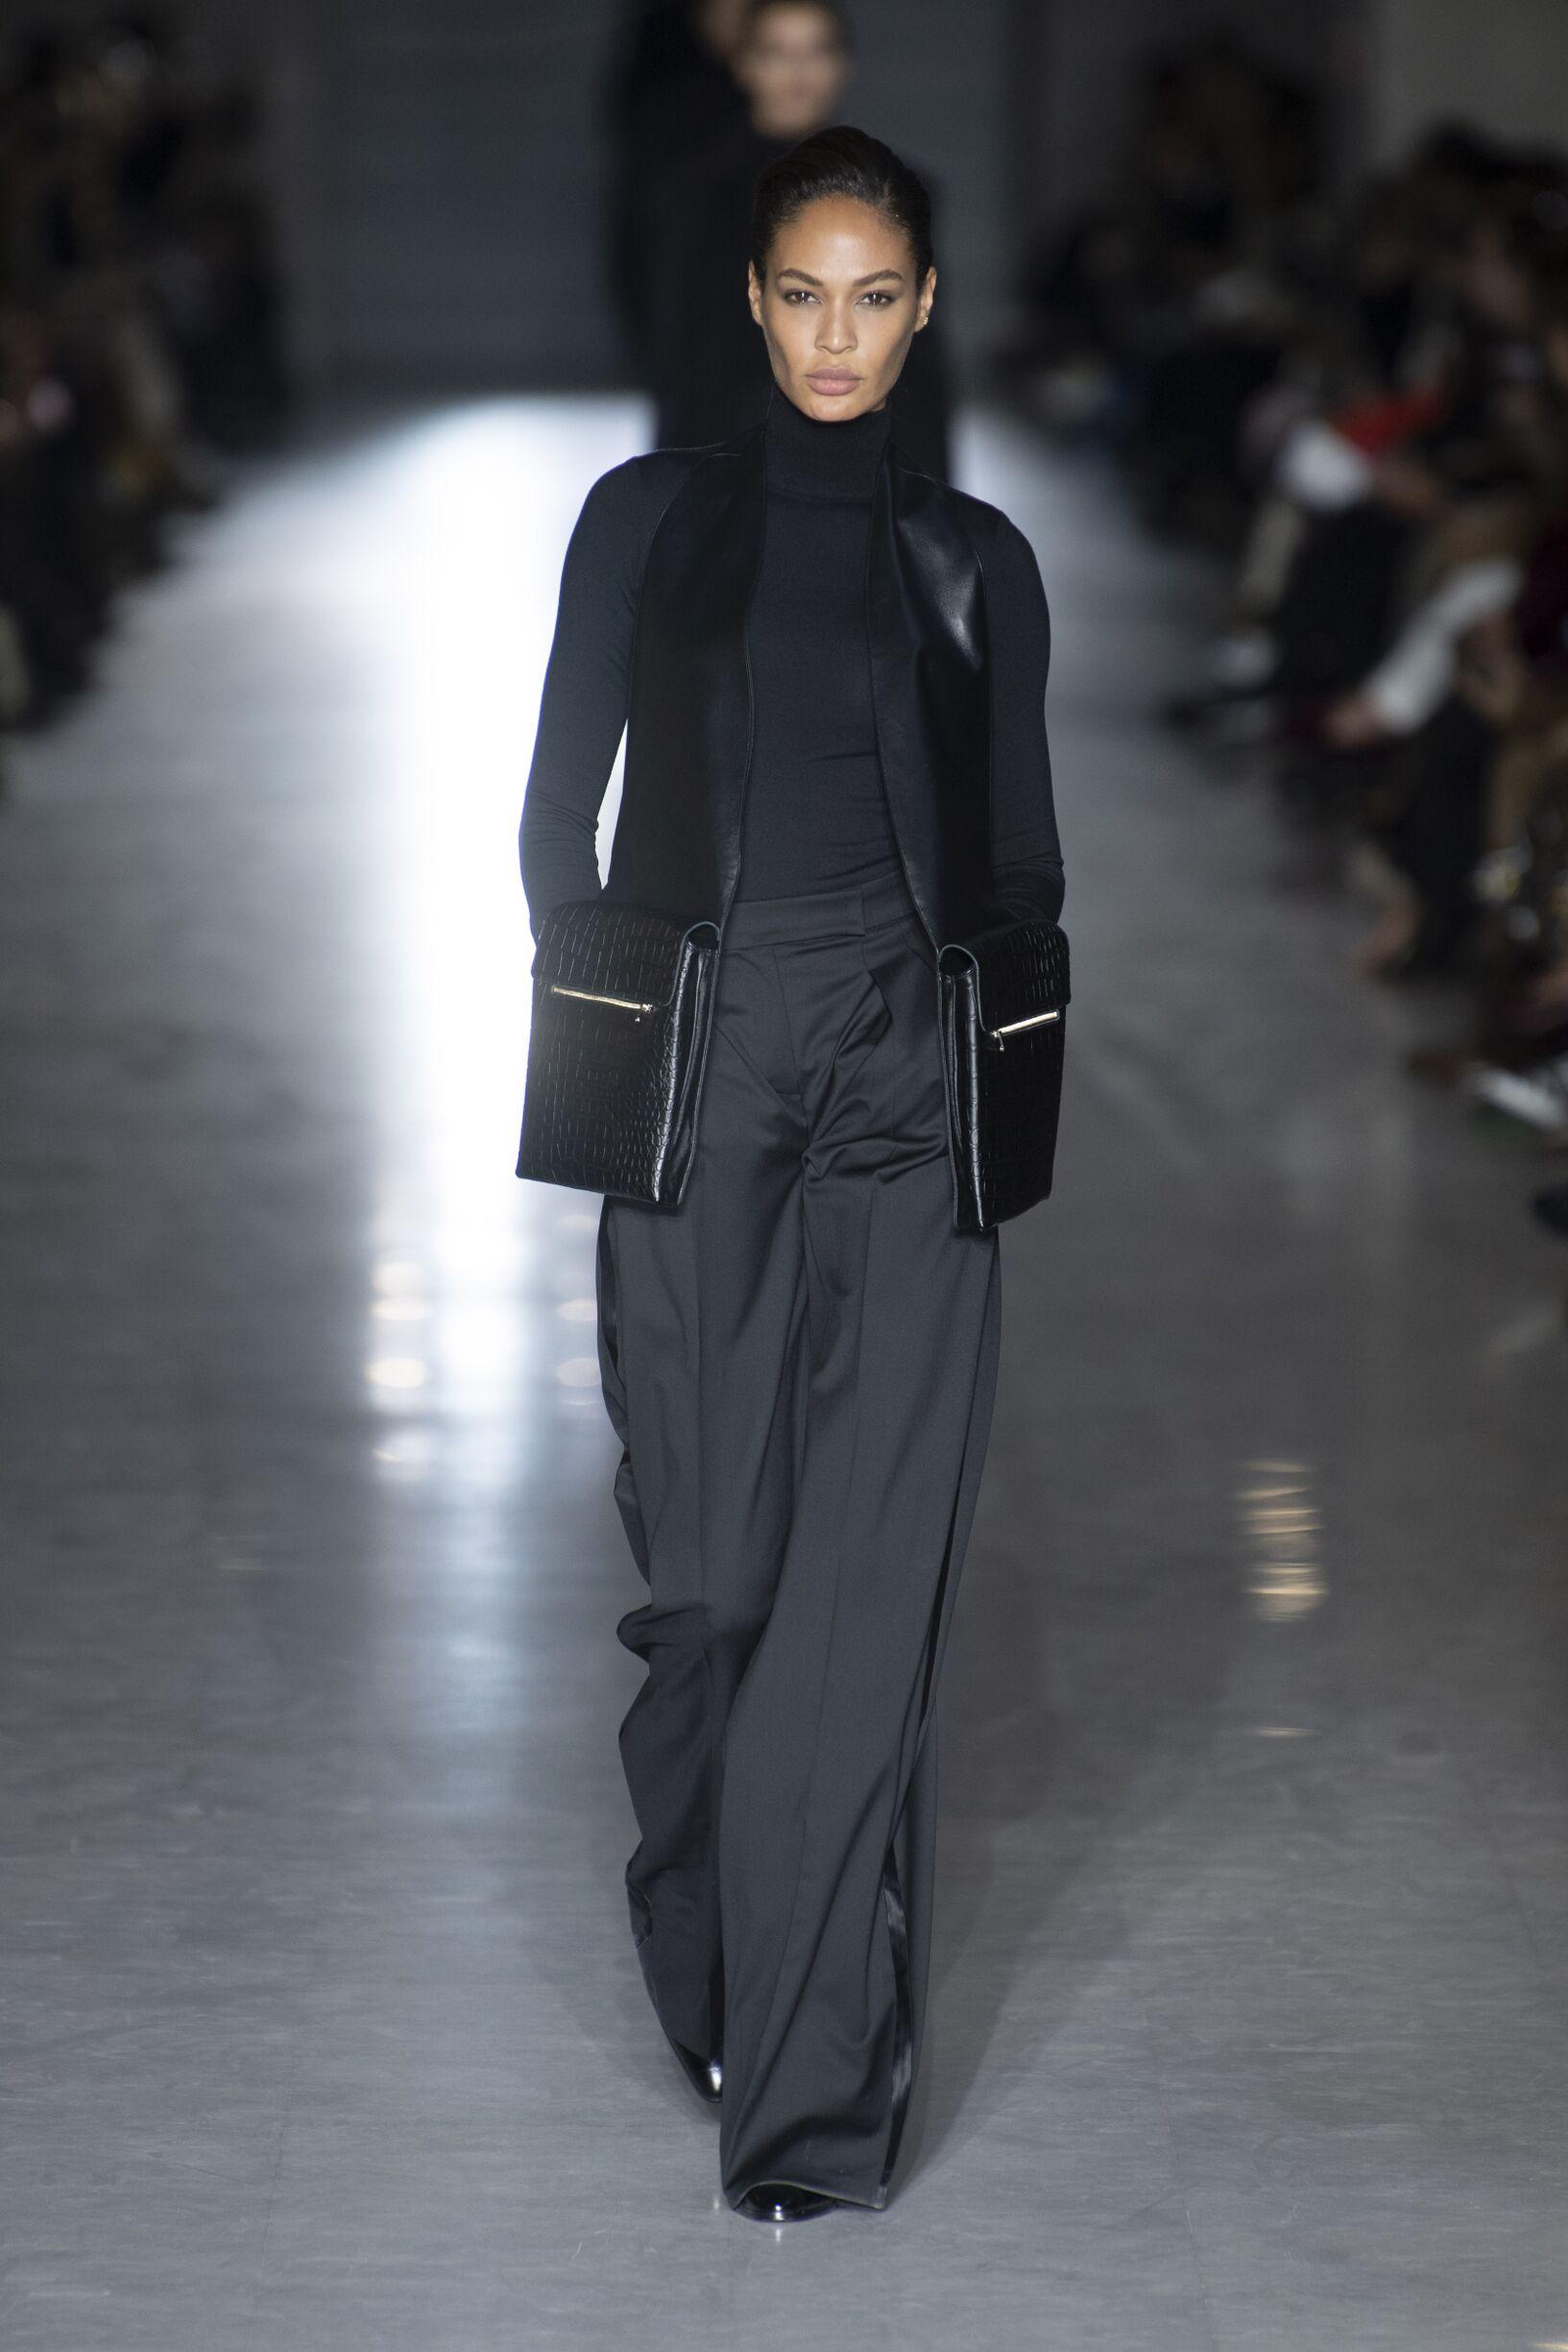 2019 Woman Max Mara Trends Milan Fashion Week